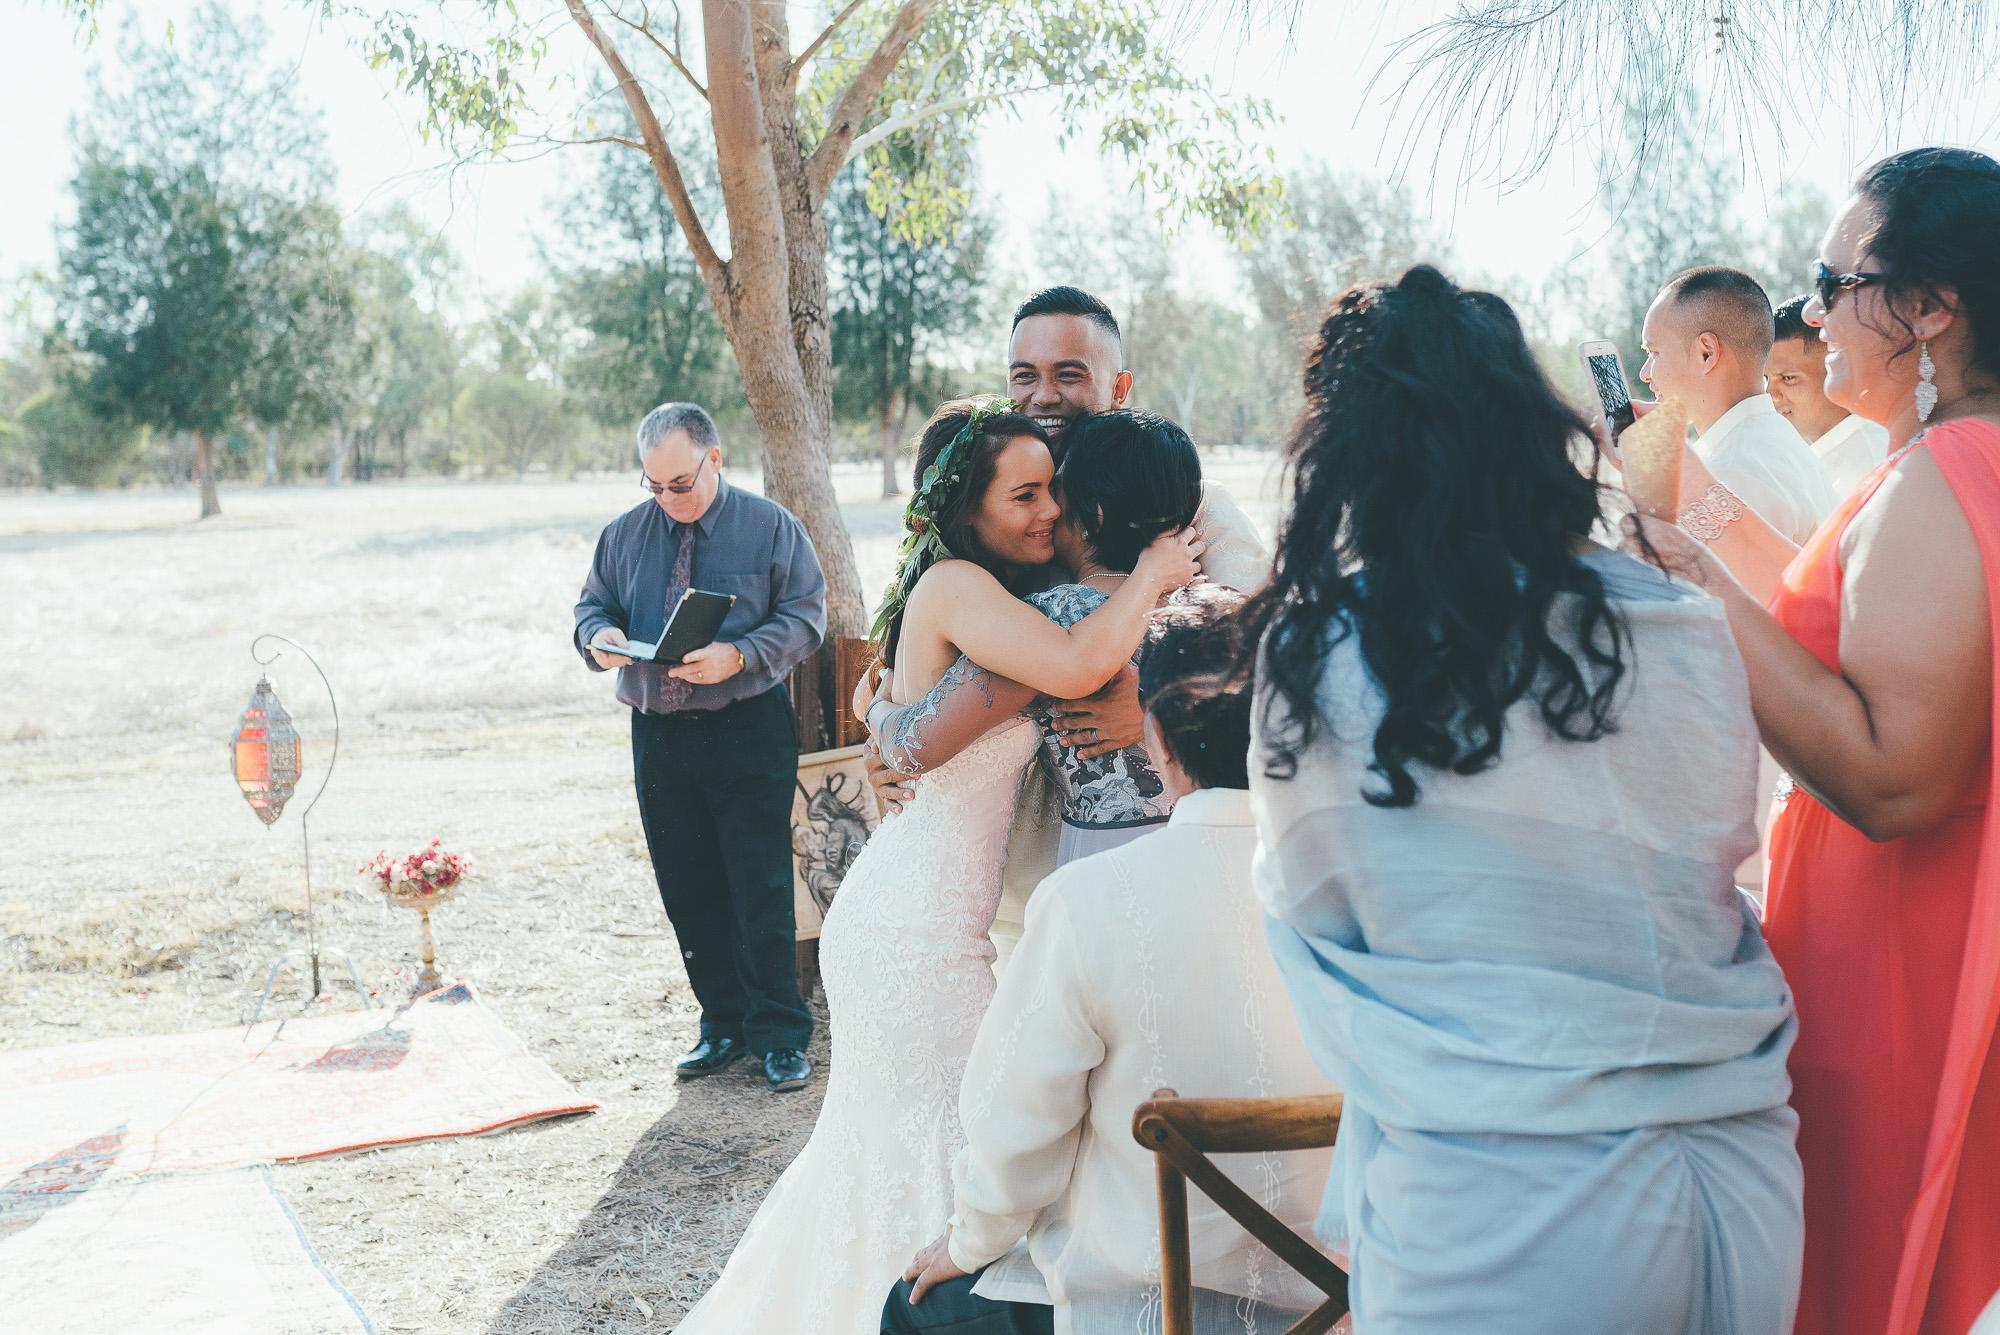 wedding-photographer-outdoor-casual-styled-los-angeles-australia-california-international-earthbound -47.jpg